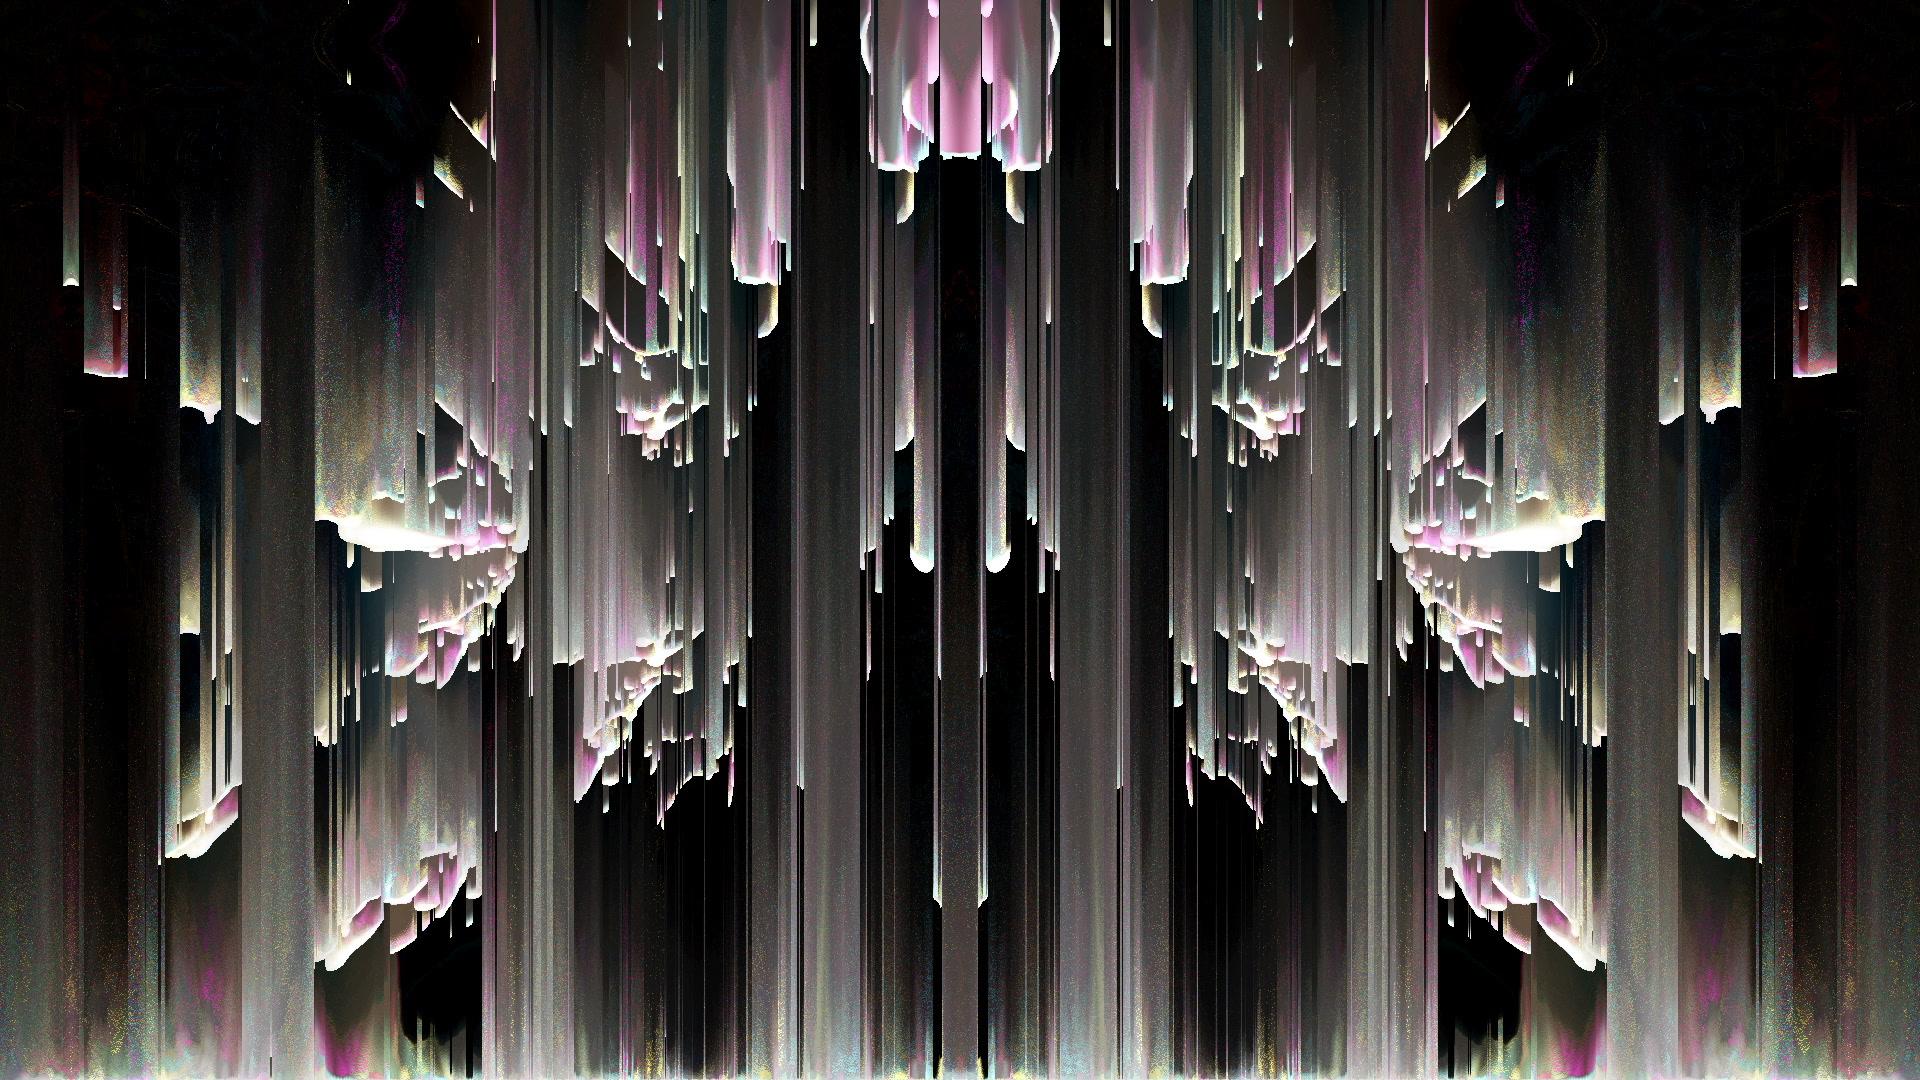 vj video background Tunnel-Rain-LIMEART-VJ-Loop_003